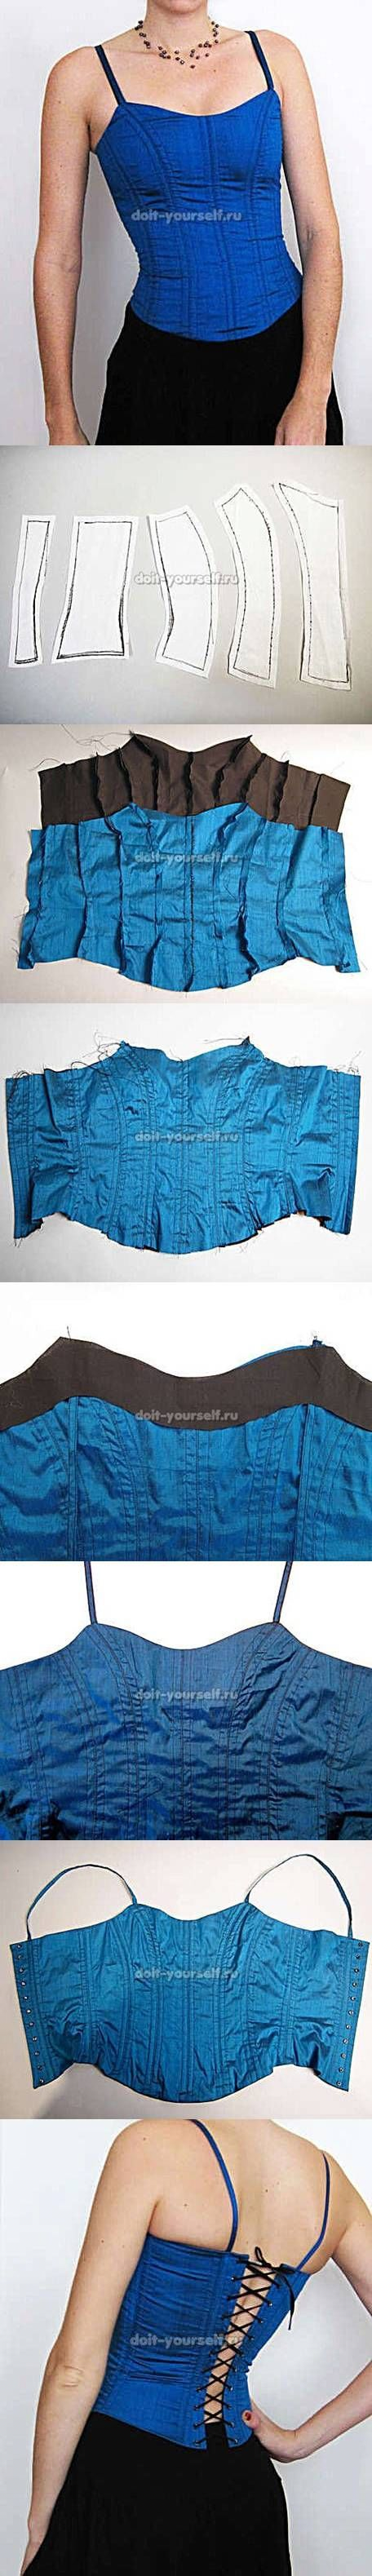 How to make a diy tanktop fashion diy diy ideas diy crafts do it yourself diy projects diy fashion tanktop